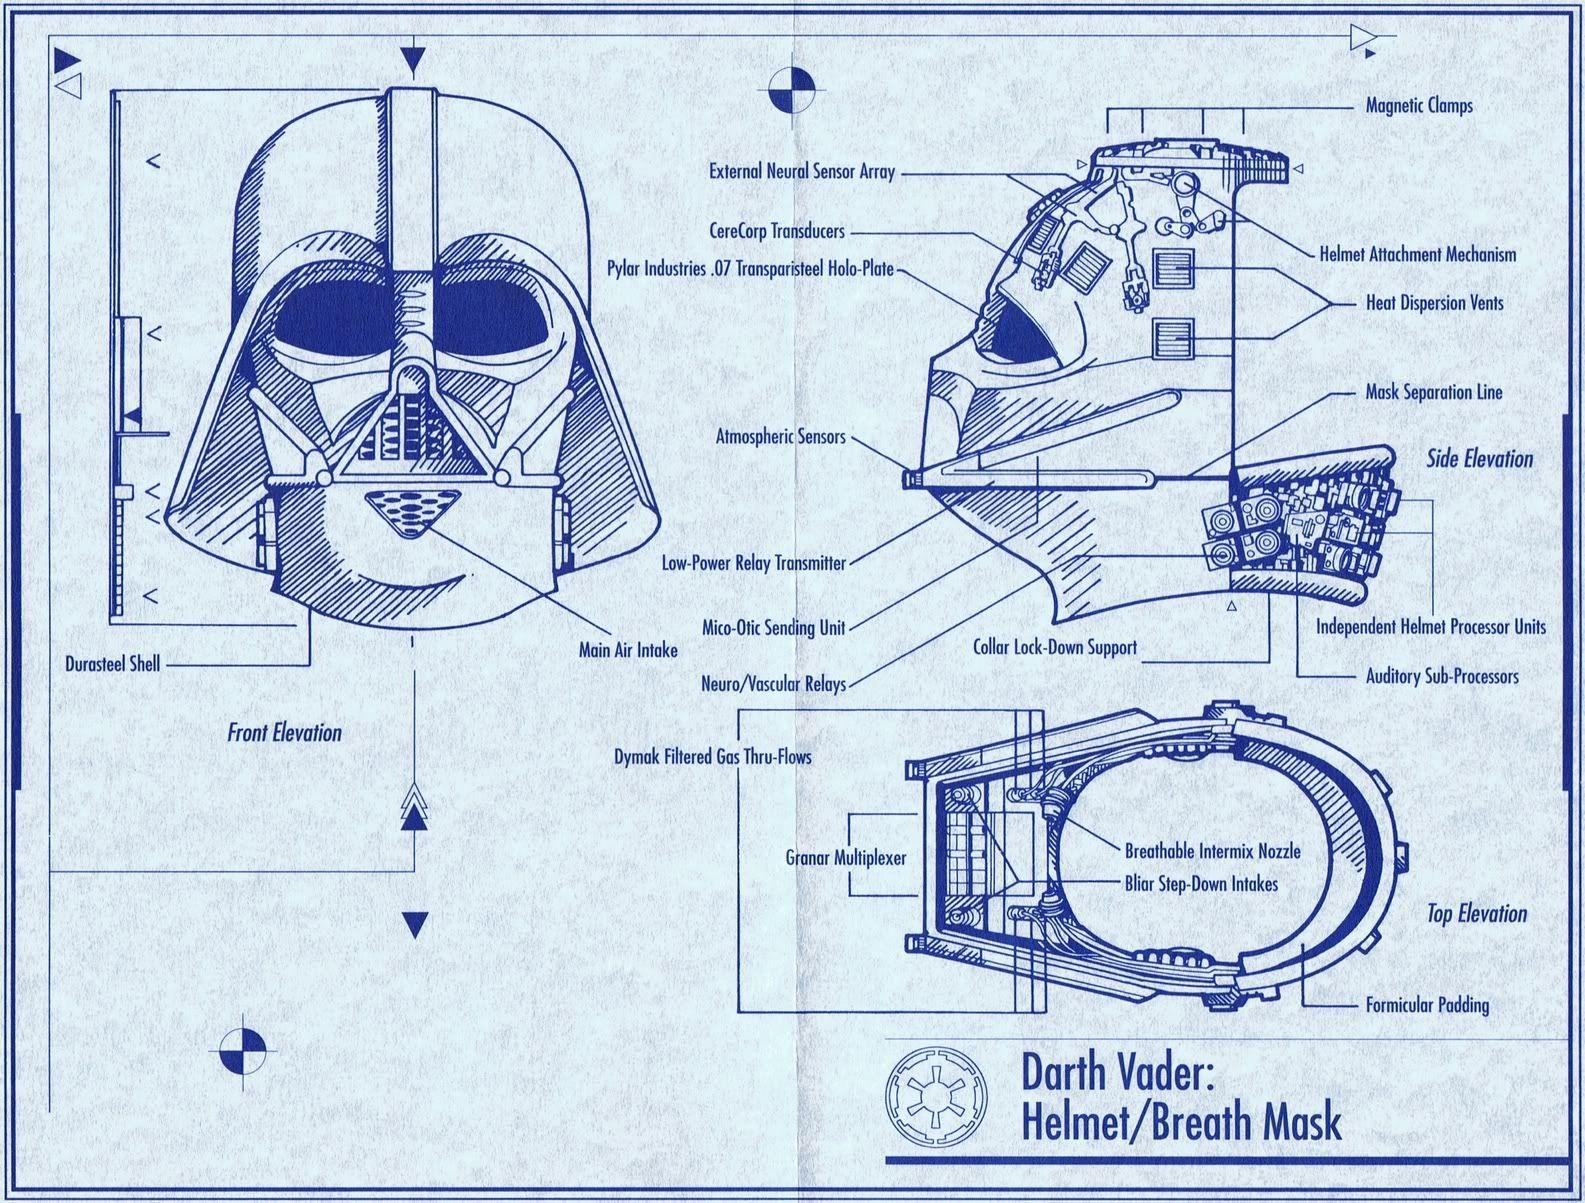 Darth vaders armor vader helmet darth vader and star darth vaders helmet blueprint malvernweather Images